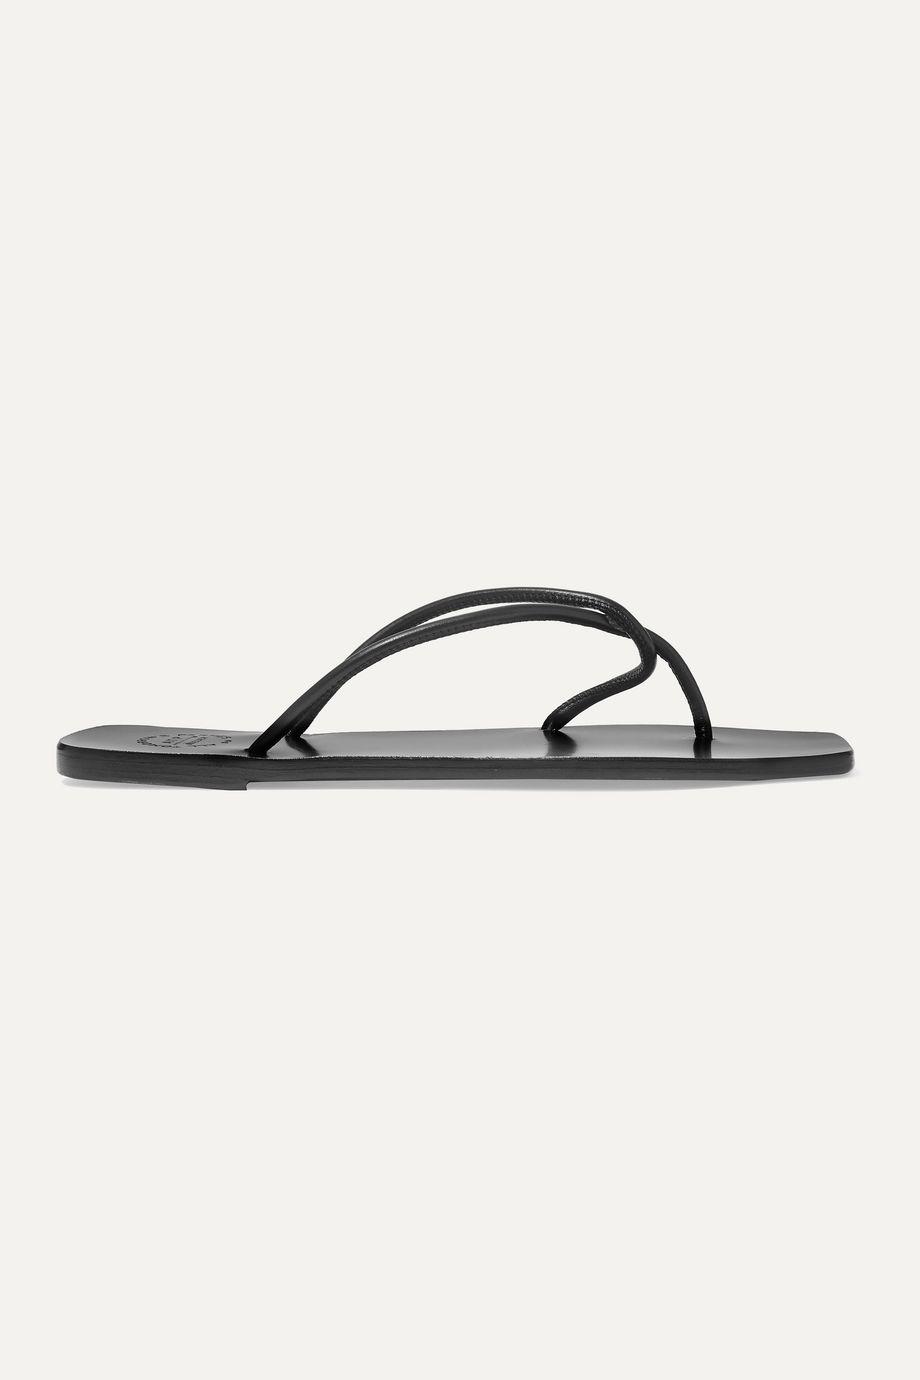 ATP Atelier Alessano leather sandals